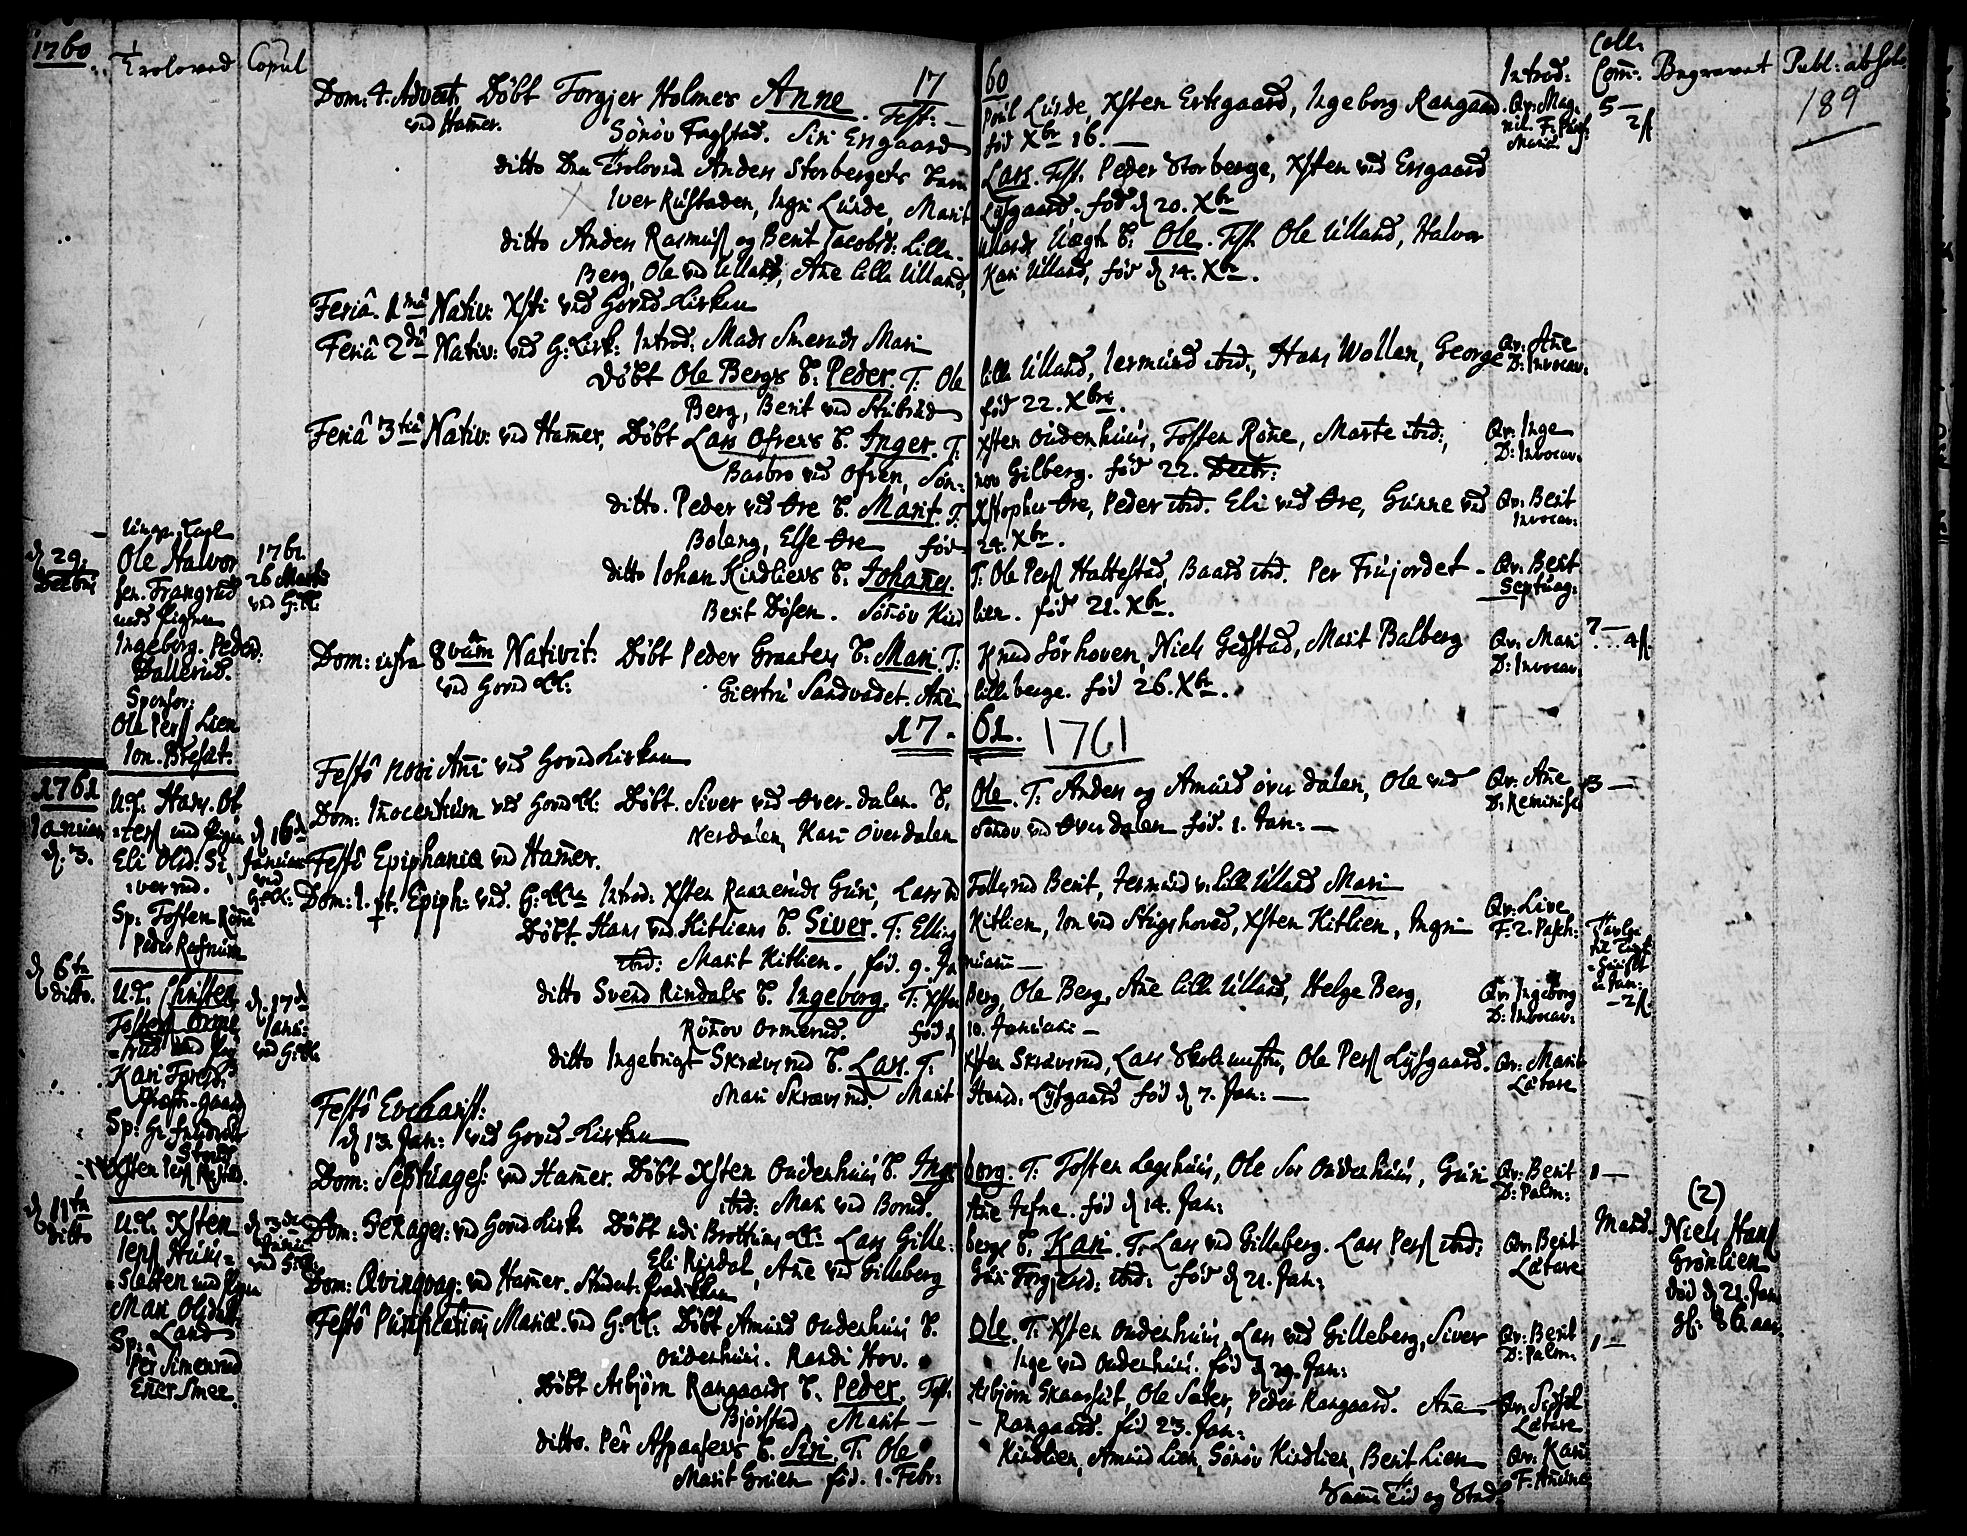 SAH, Fåberg prestekontor, Ministerialbok nr. 1, 1727-1775, s. 189